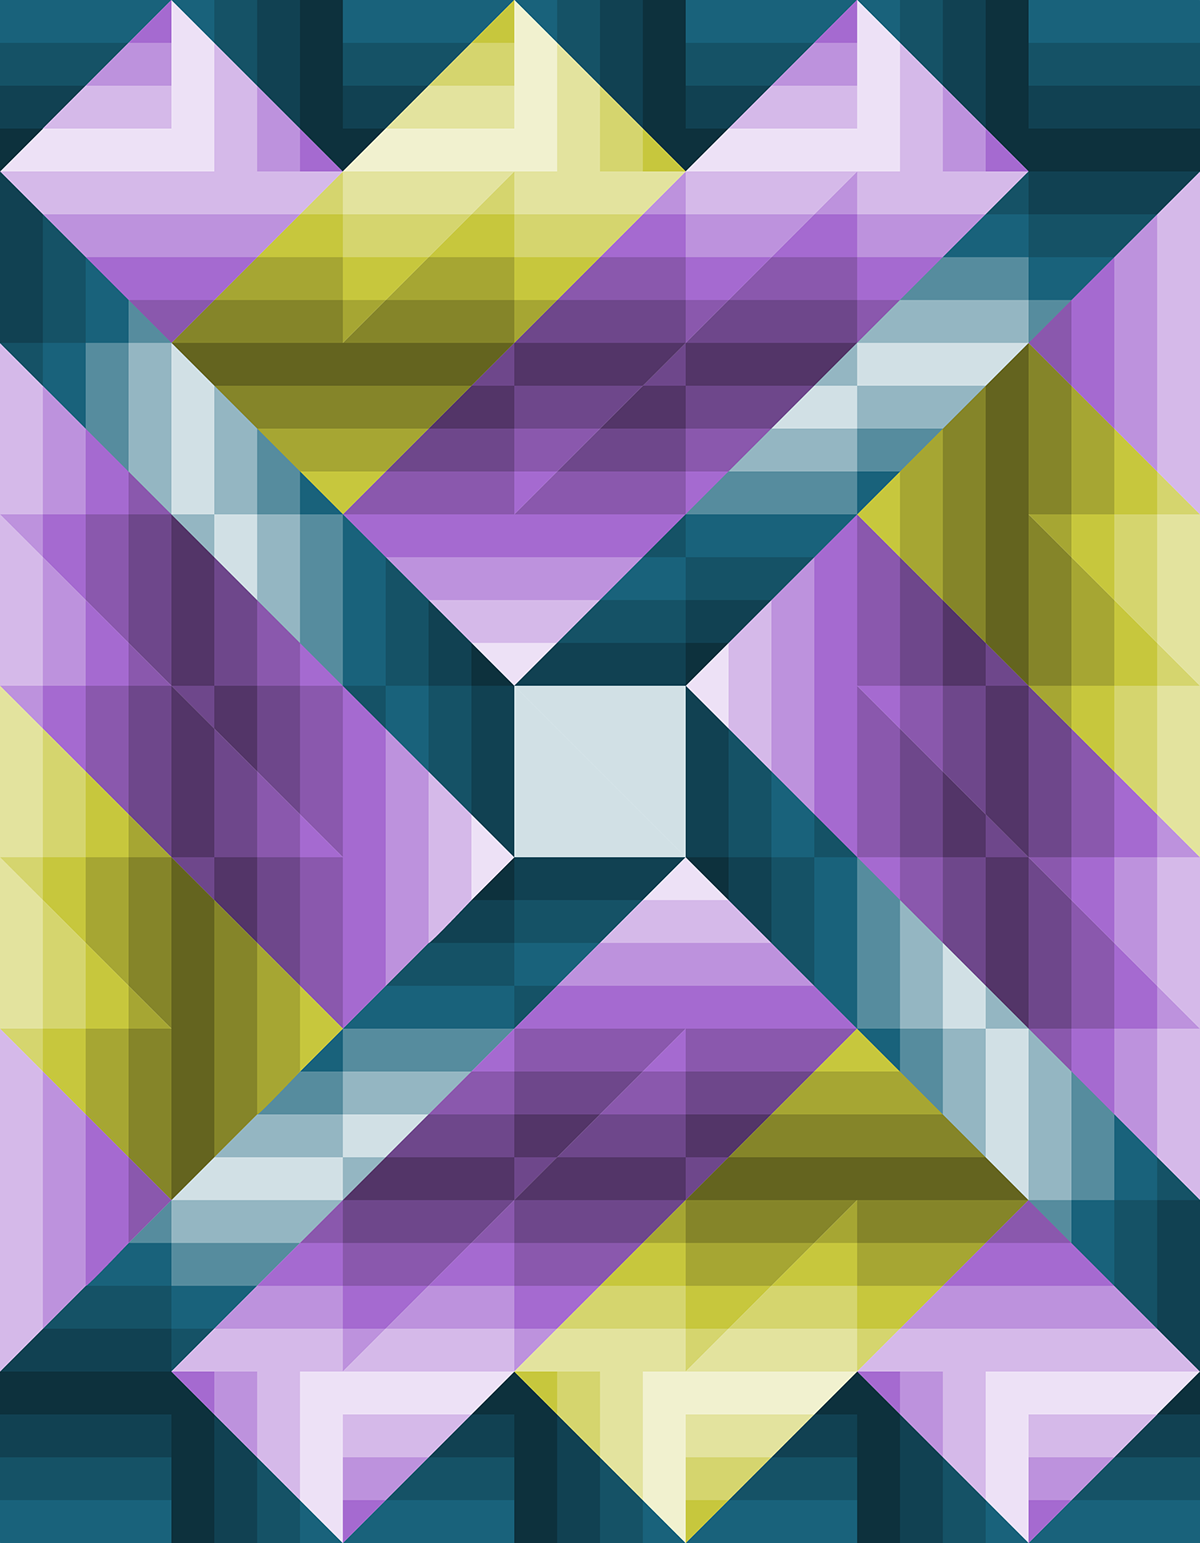 Student Work u2014 Color Achromatic Design on